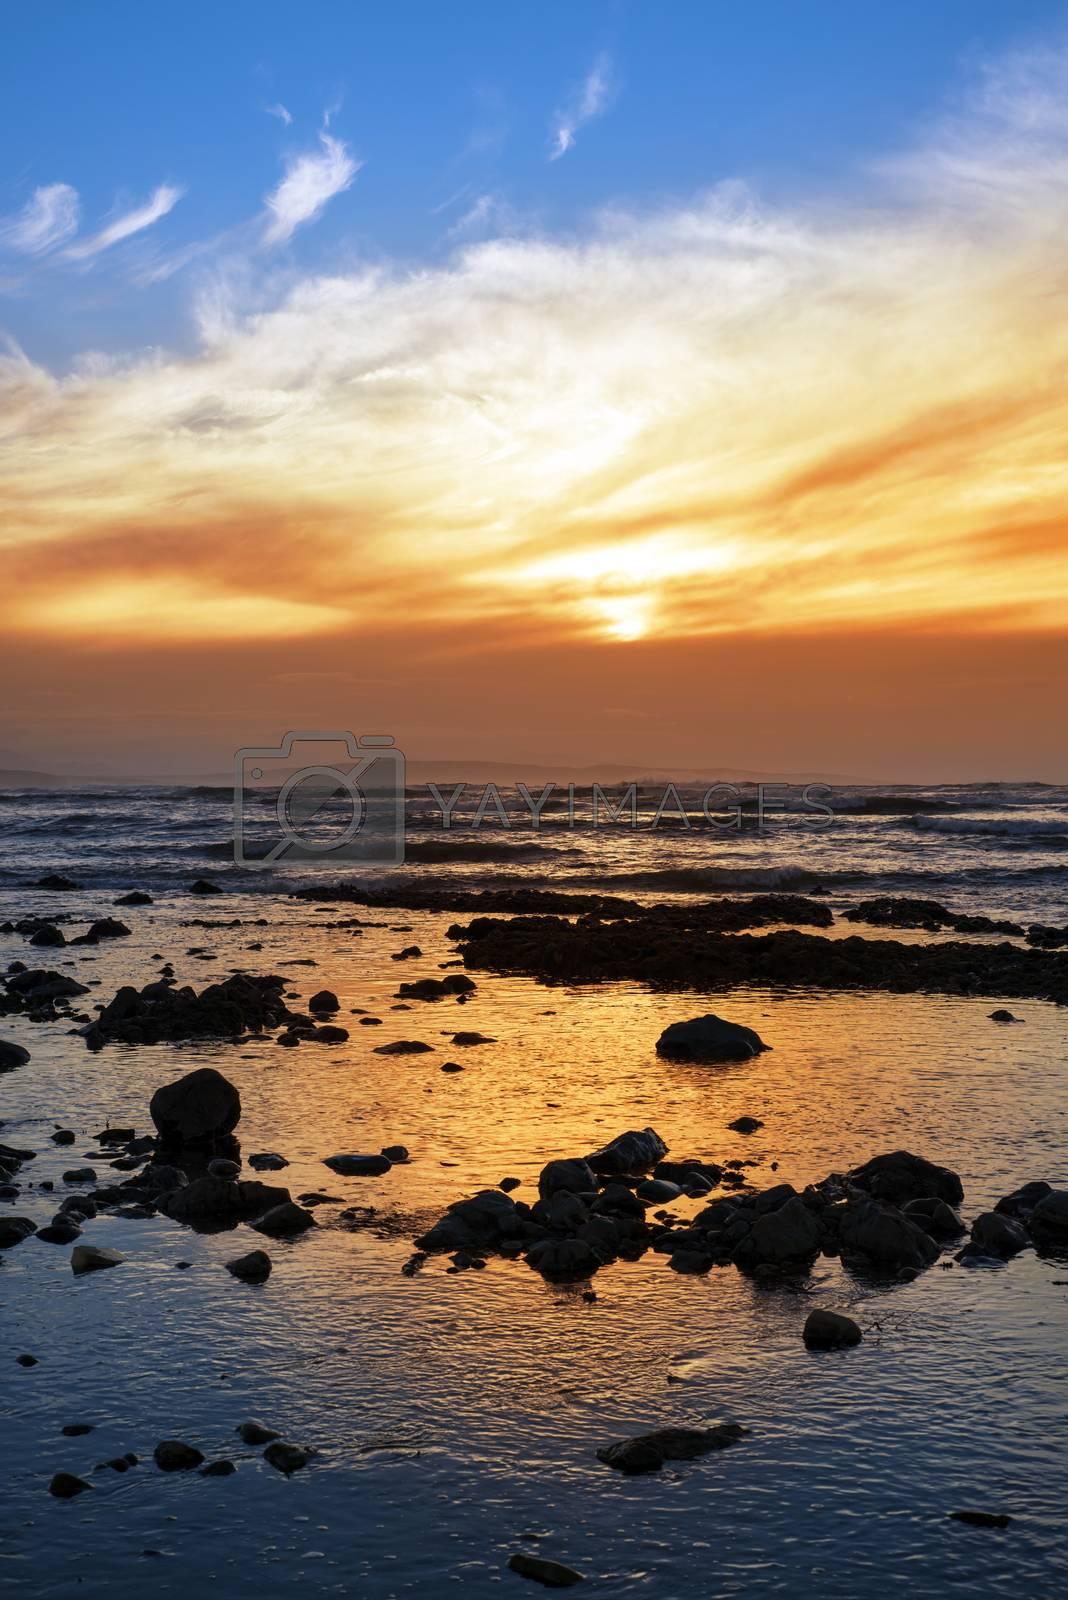 reflections at rocky beach near ballybunion on the wild atlantic way ireland with a beautiful yellow sunset